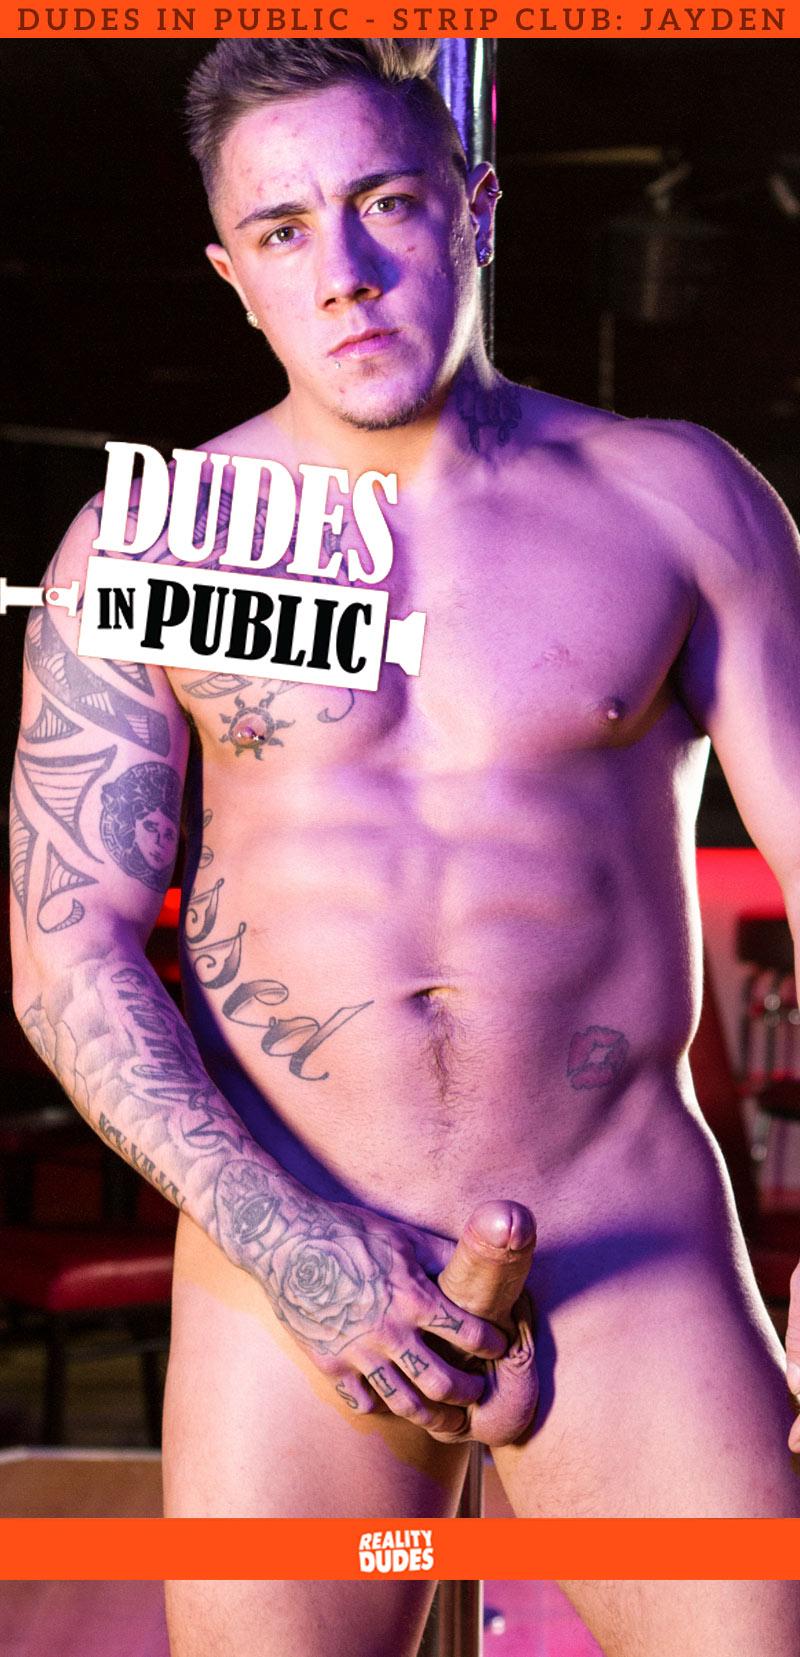 Dudes In Public, Strip Club: Jayden